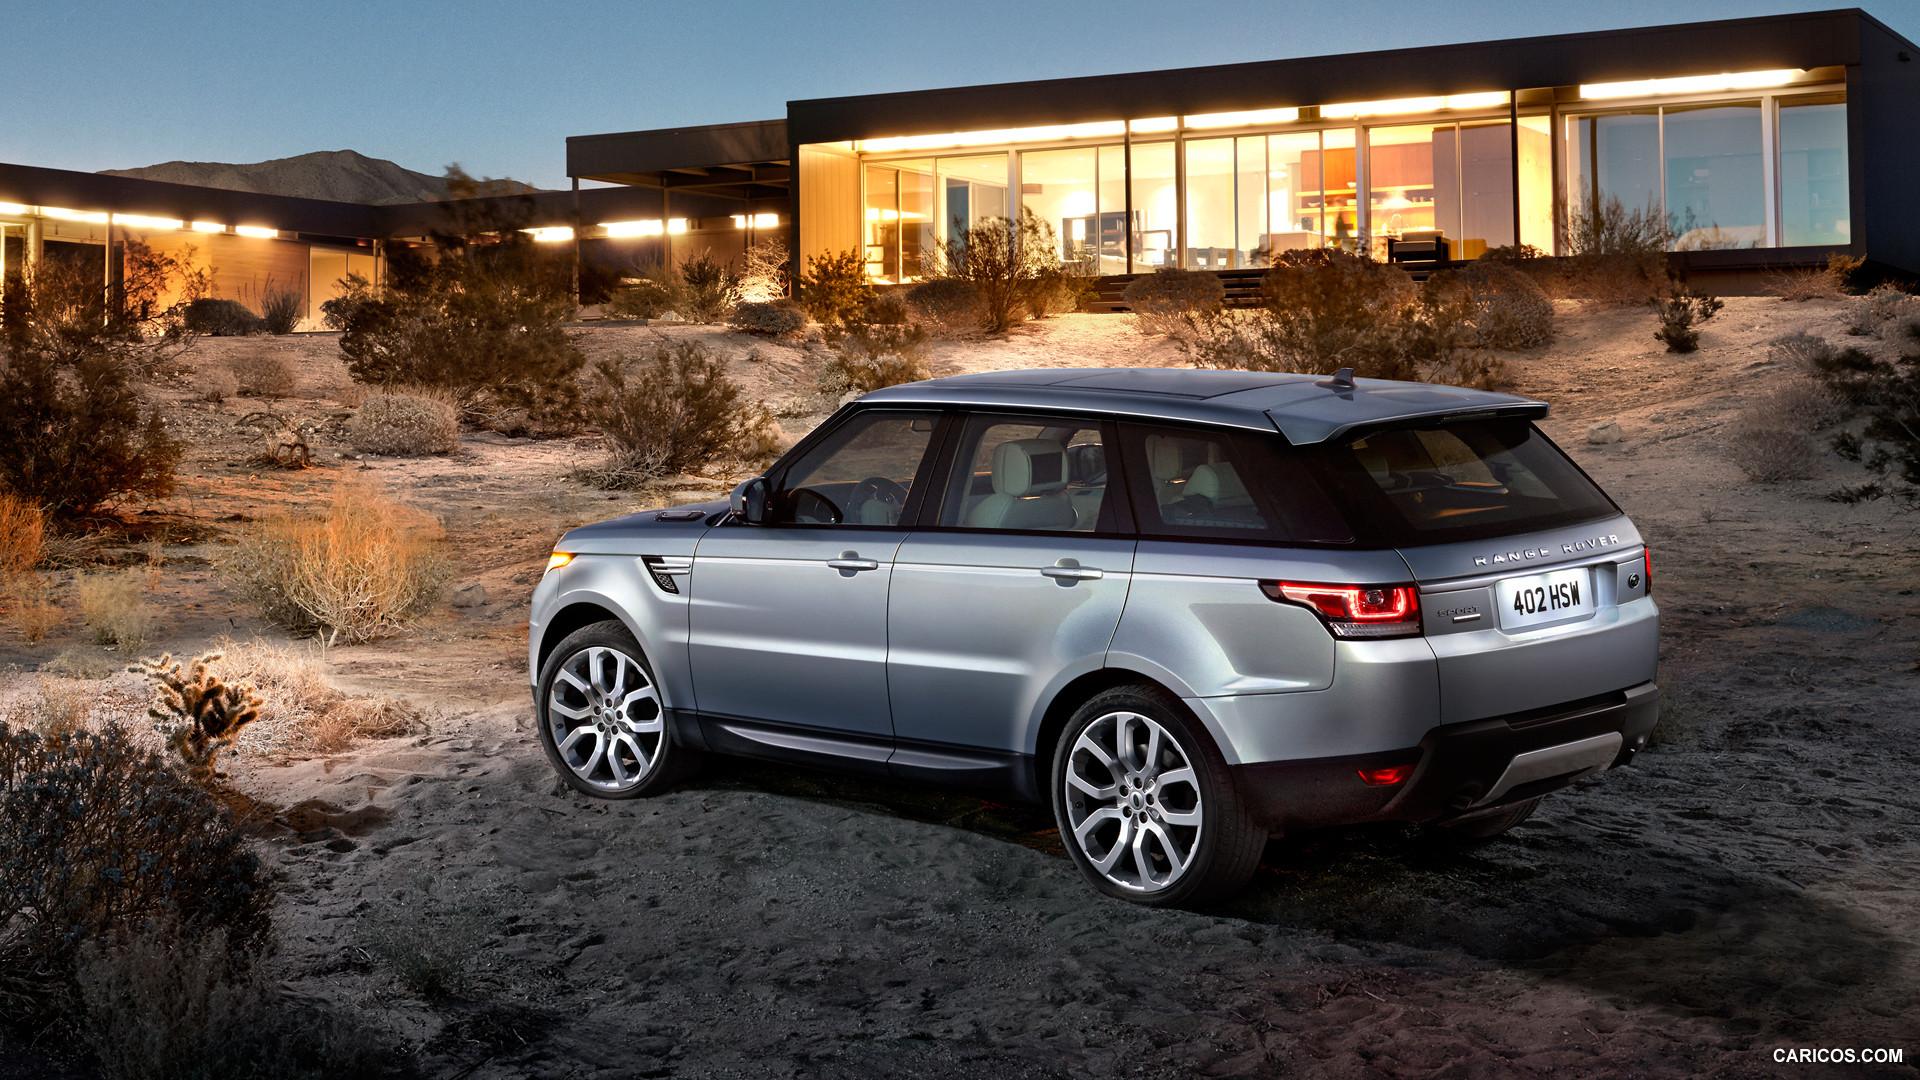 2014 Land Rover Range Rover Image 12